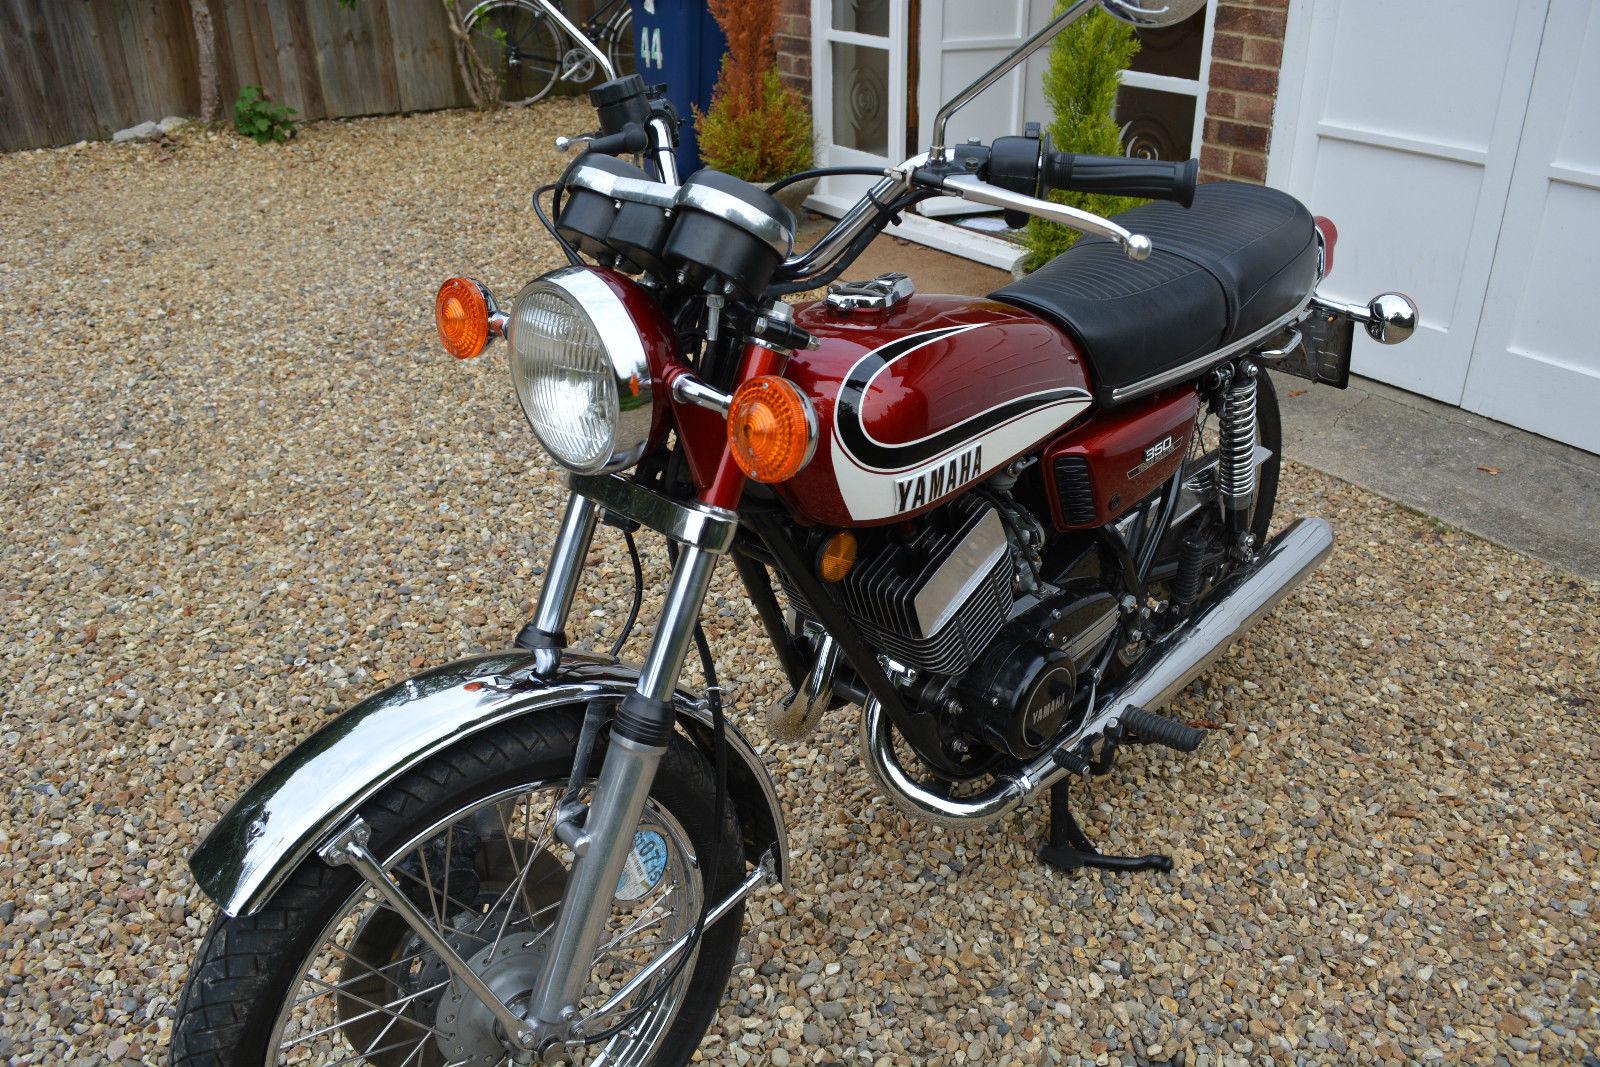 Restored Yamaha RD350 - 1975 Photographs at Classic Bikes